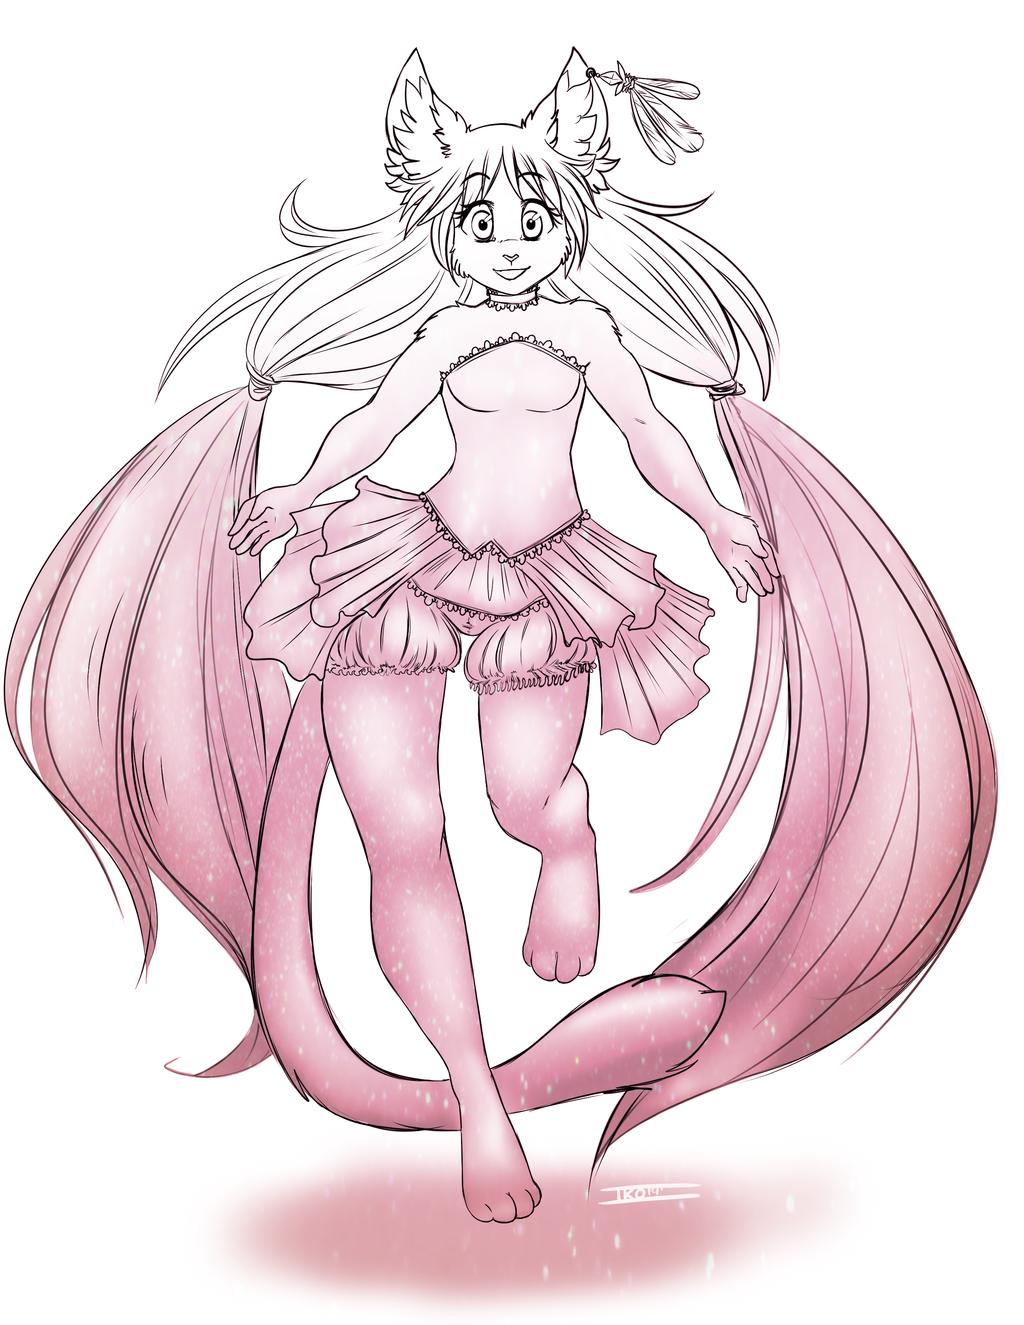 Magical gal